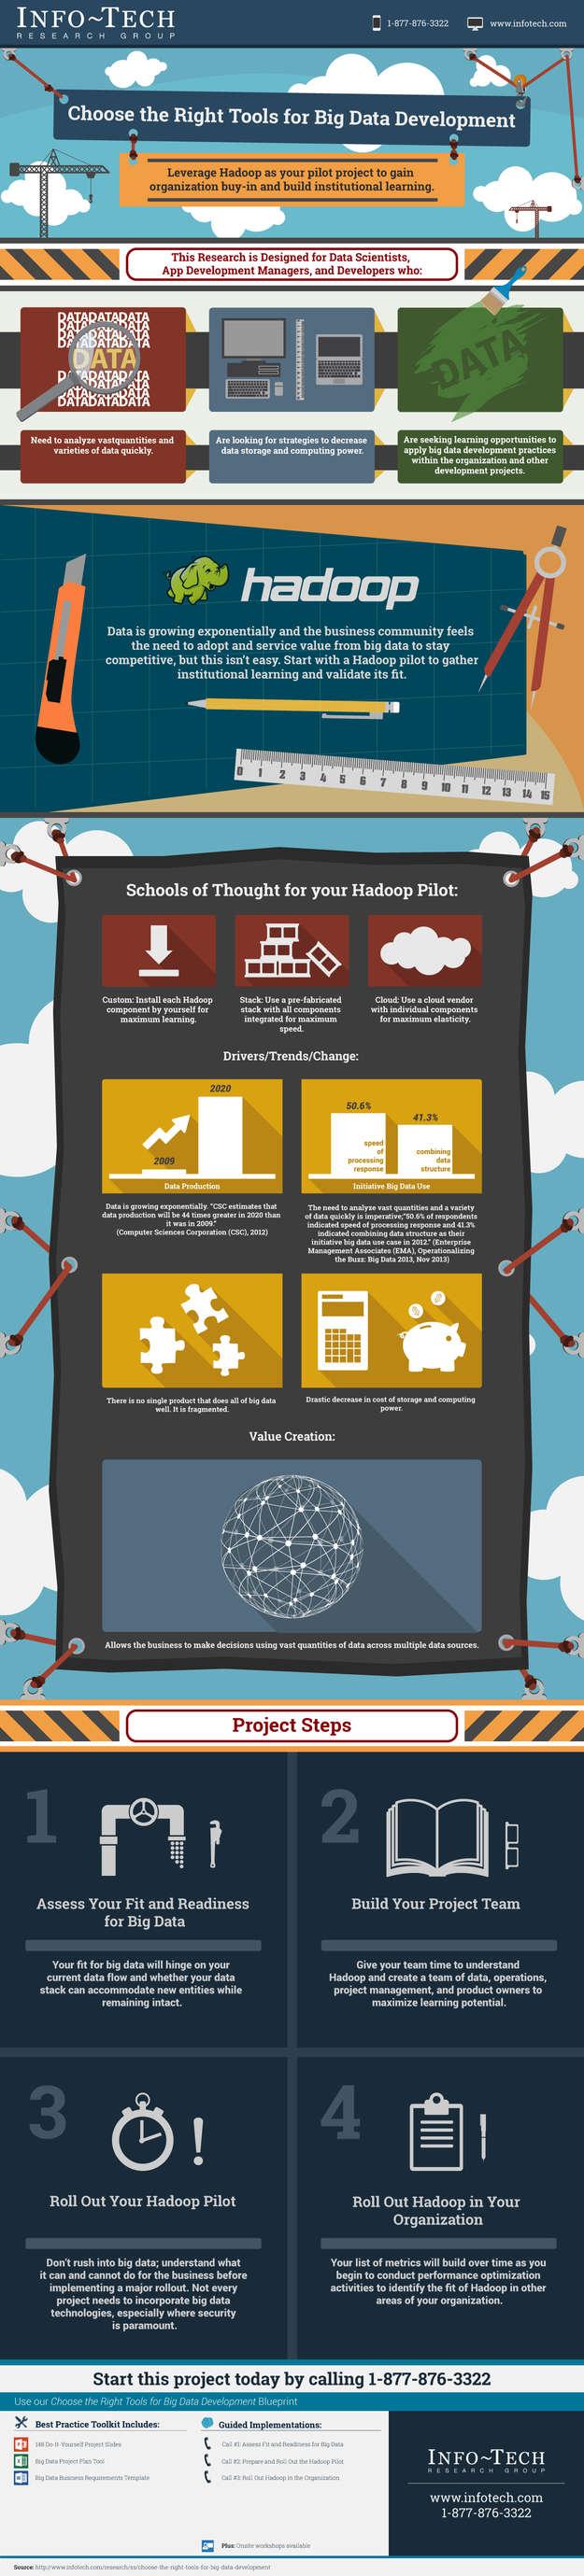 Choose the Right Tools for Big Data Development thumbnail